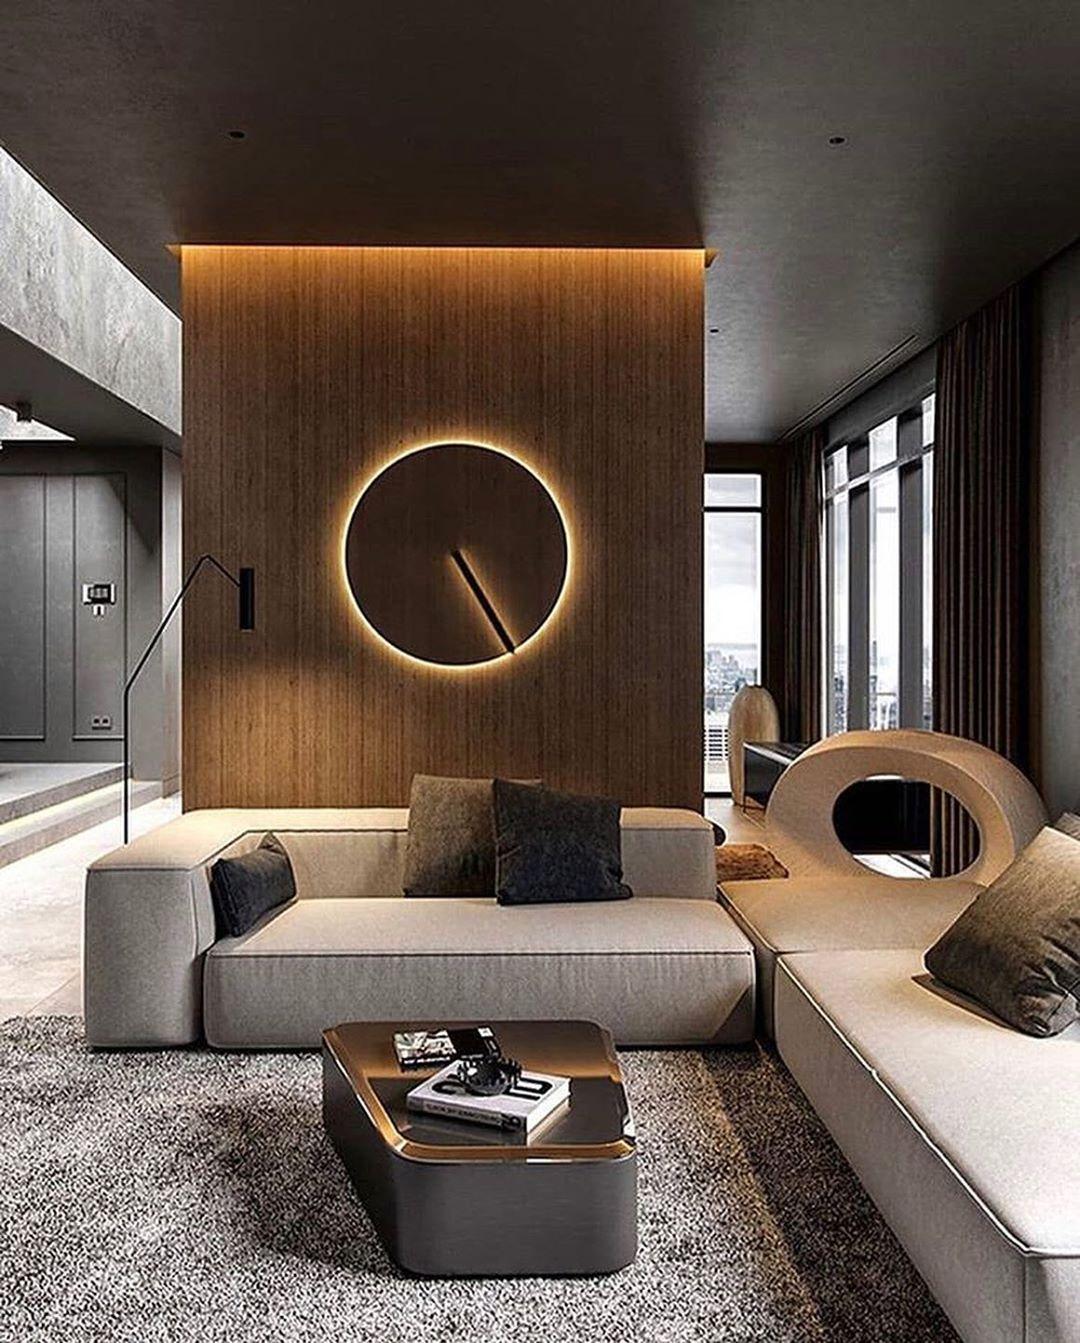 Mi Piace 2 043 Commenti 24 Modern Interior Design Mymodern Interior Su Instagram Luxury Living Room Design Luxury Modern Homes Modern Interior Design